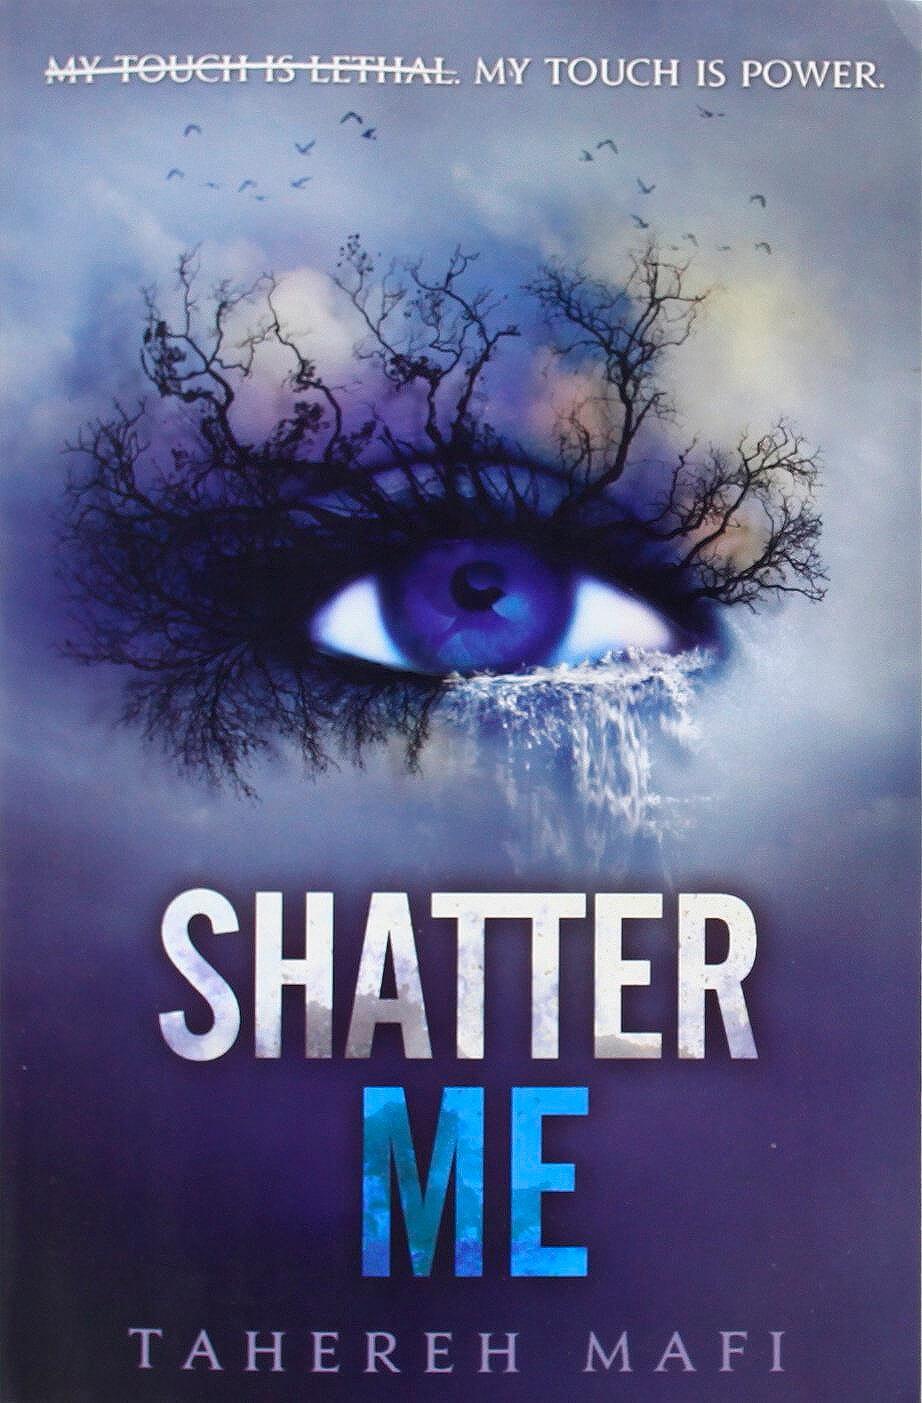 Shatter Me (Tahereh Mafi)